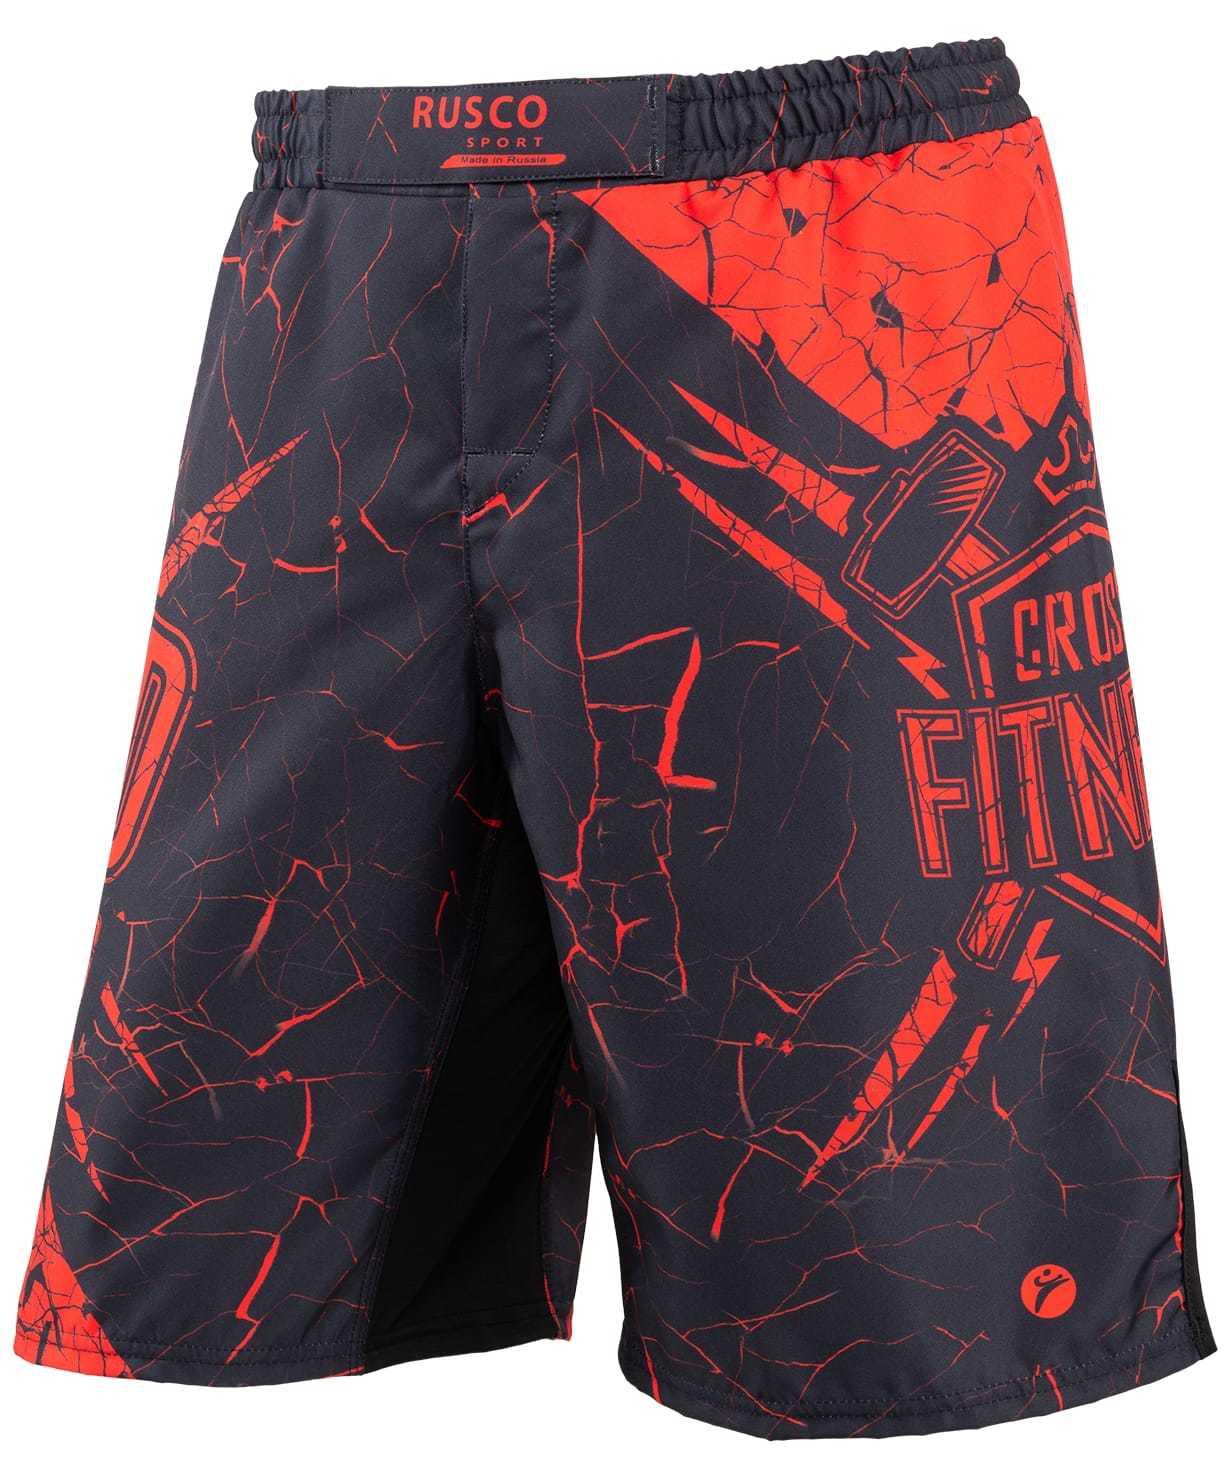 Рашгарды и шорты Шорты для MMA Cross Fitness, взрослые 1691903568472b5dc4479031b9ea987f.jpg